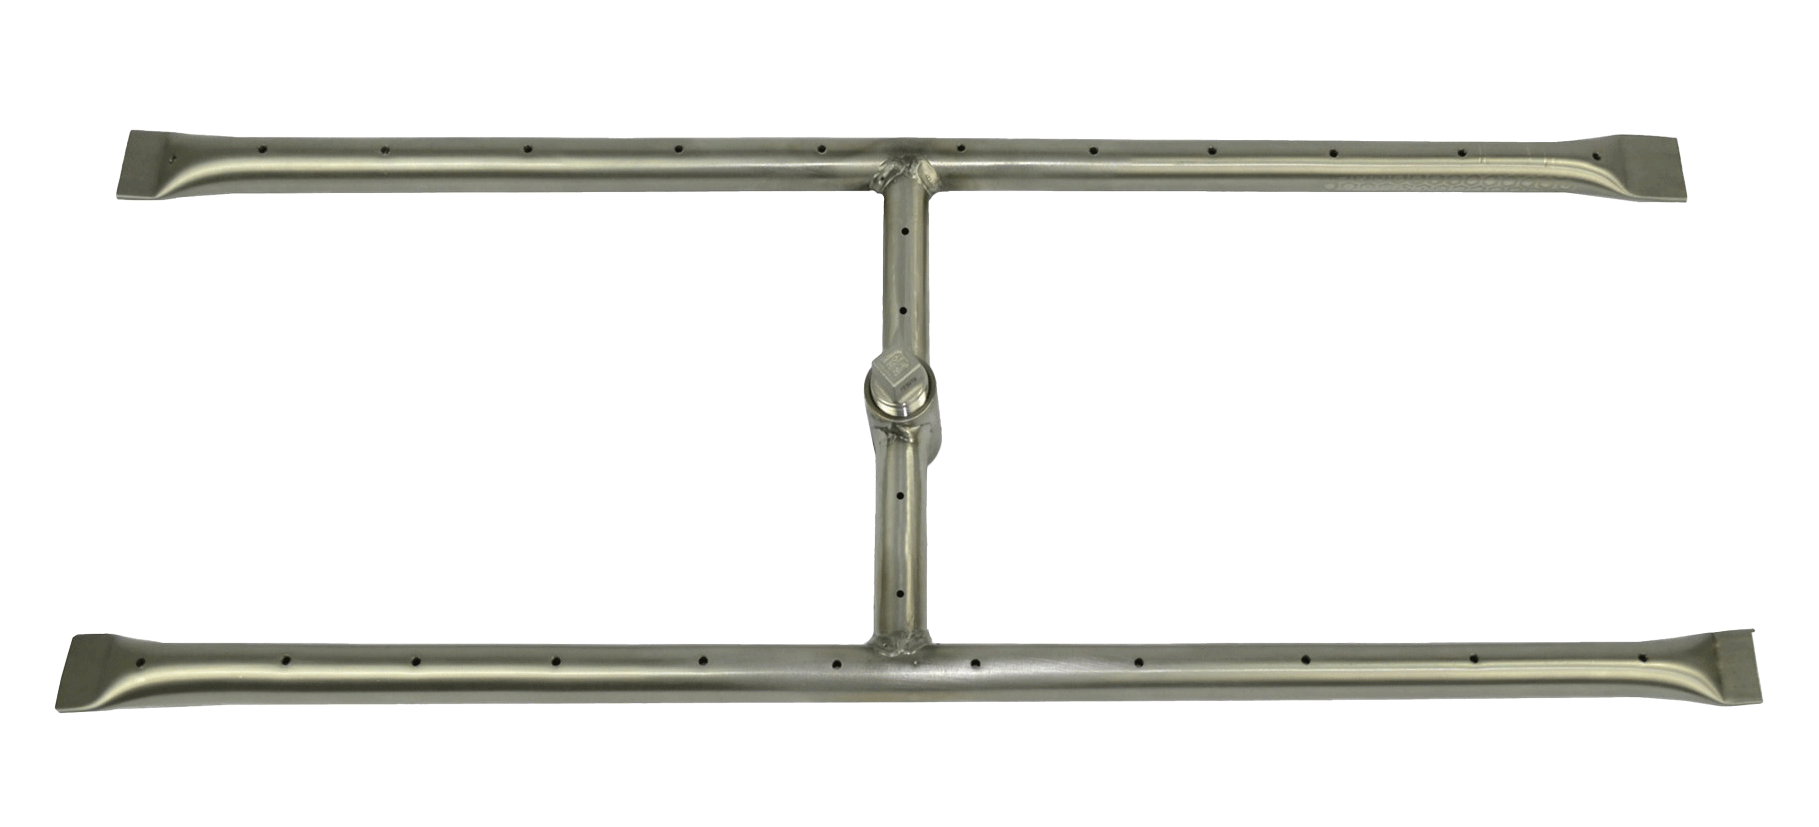 H Shaped Stainless Steel Gas Burner Kit